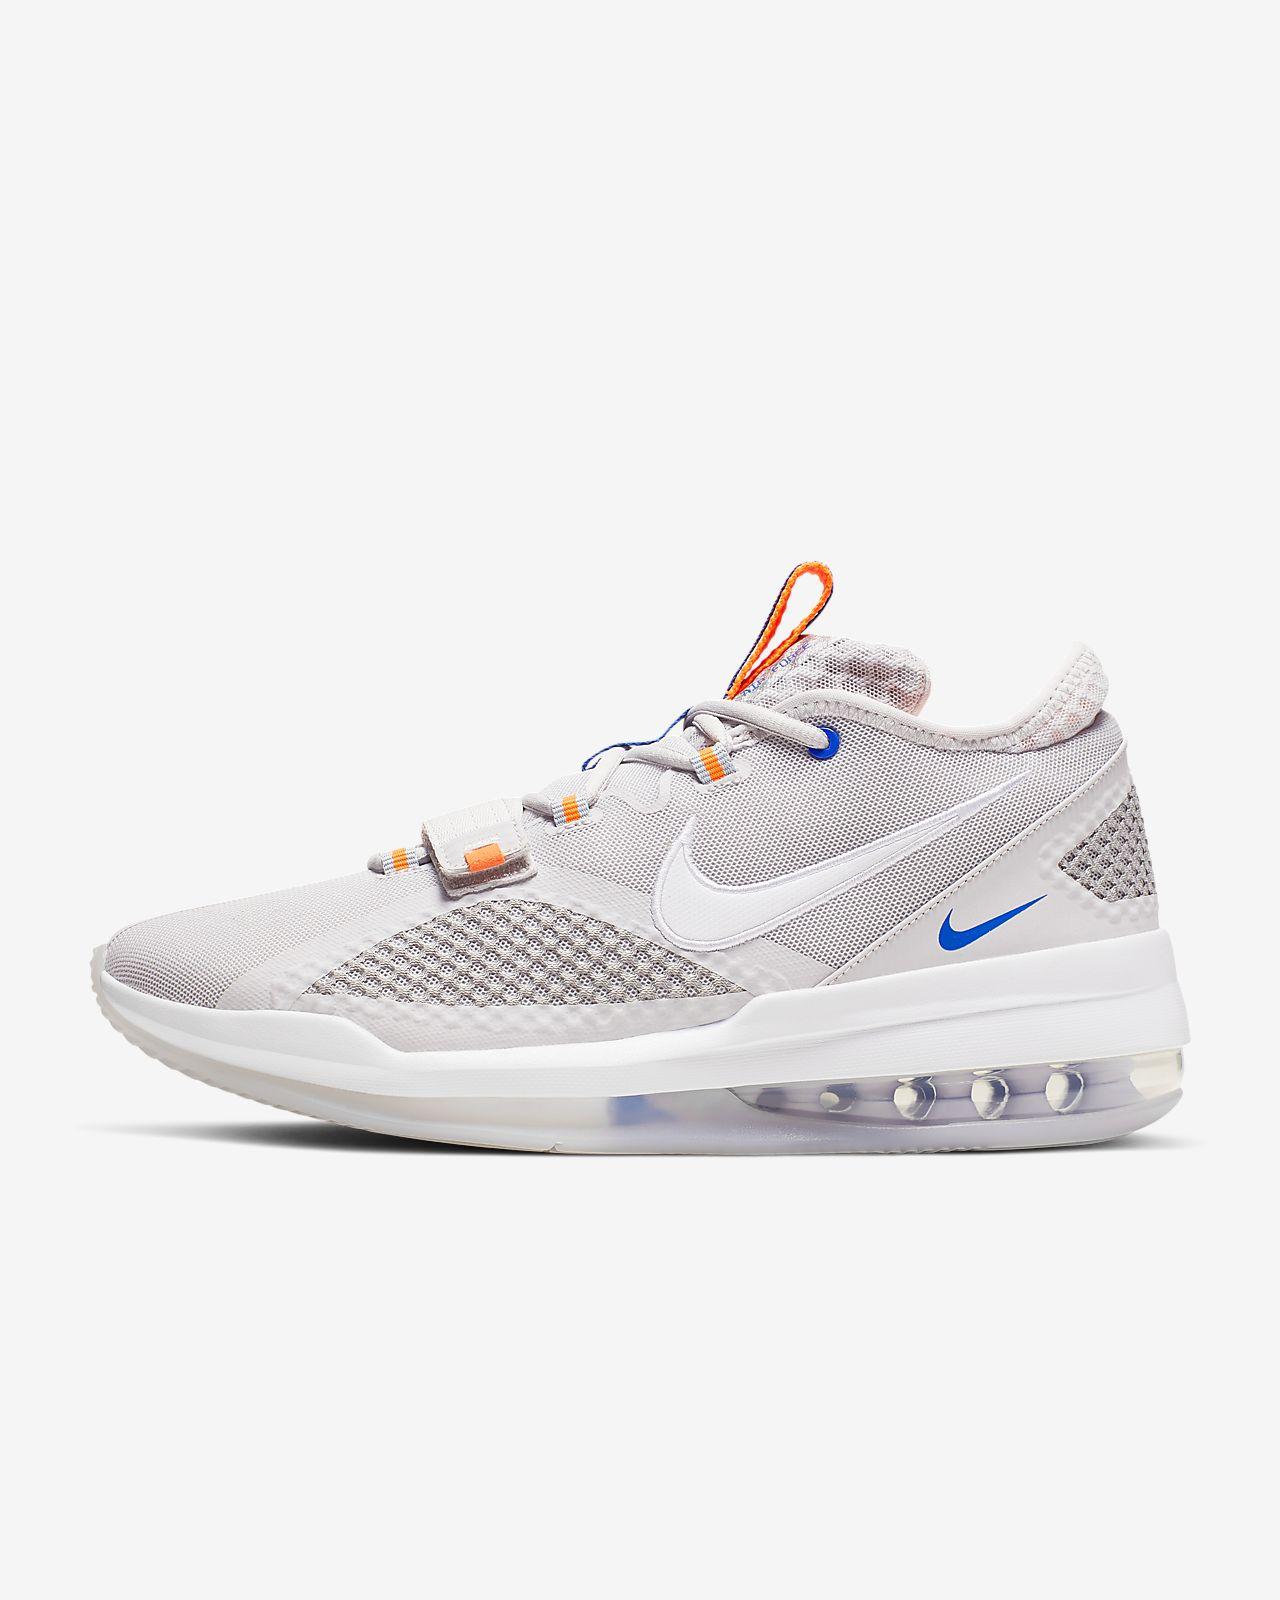 Nike Air Force Max Low Basketbalschoen